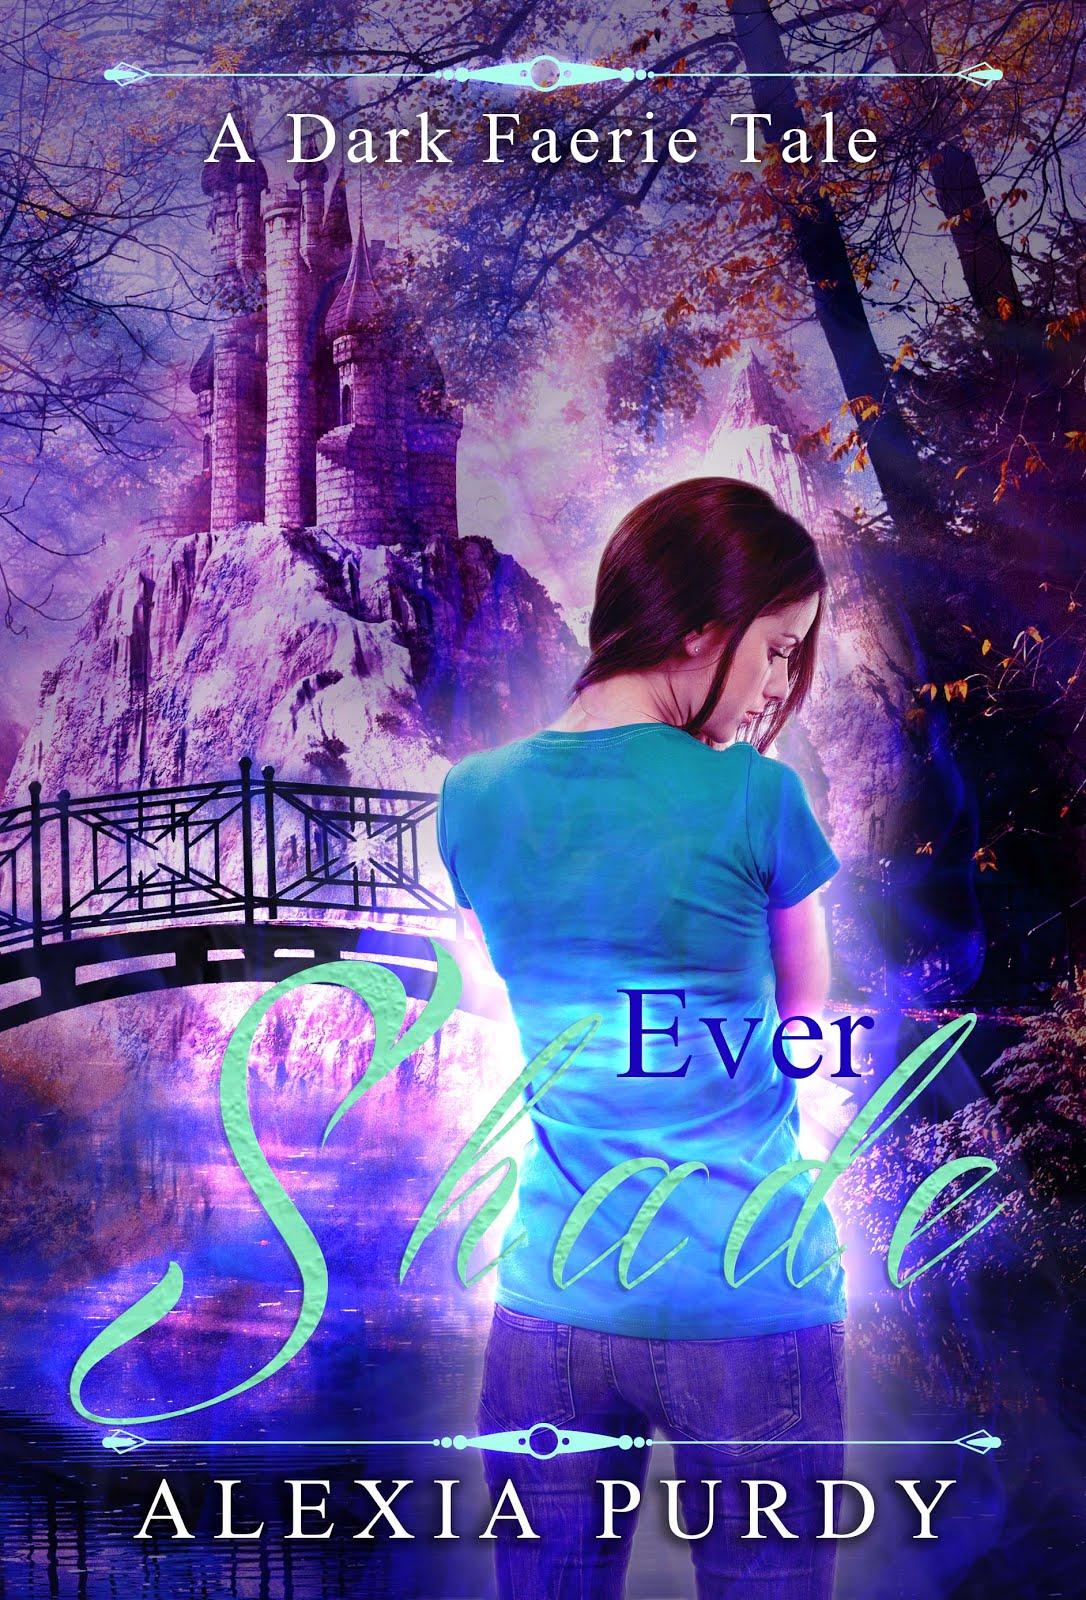 Ever Shade (A Dark Faerie Tale)